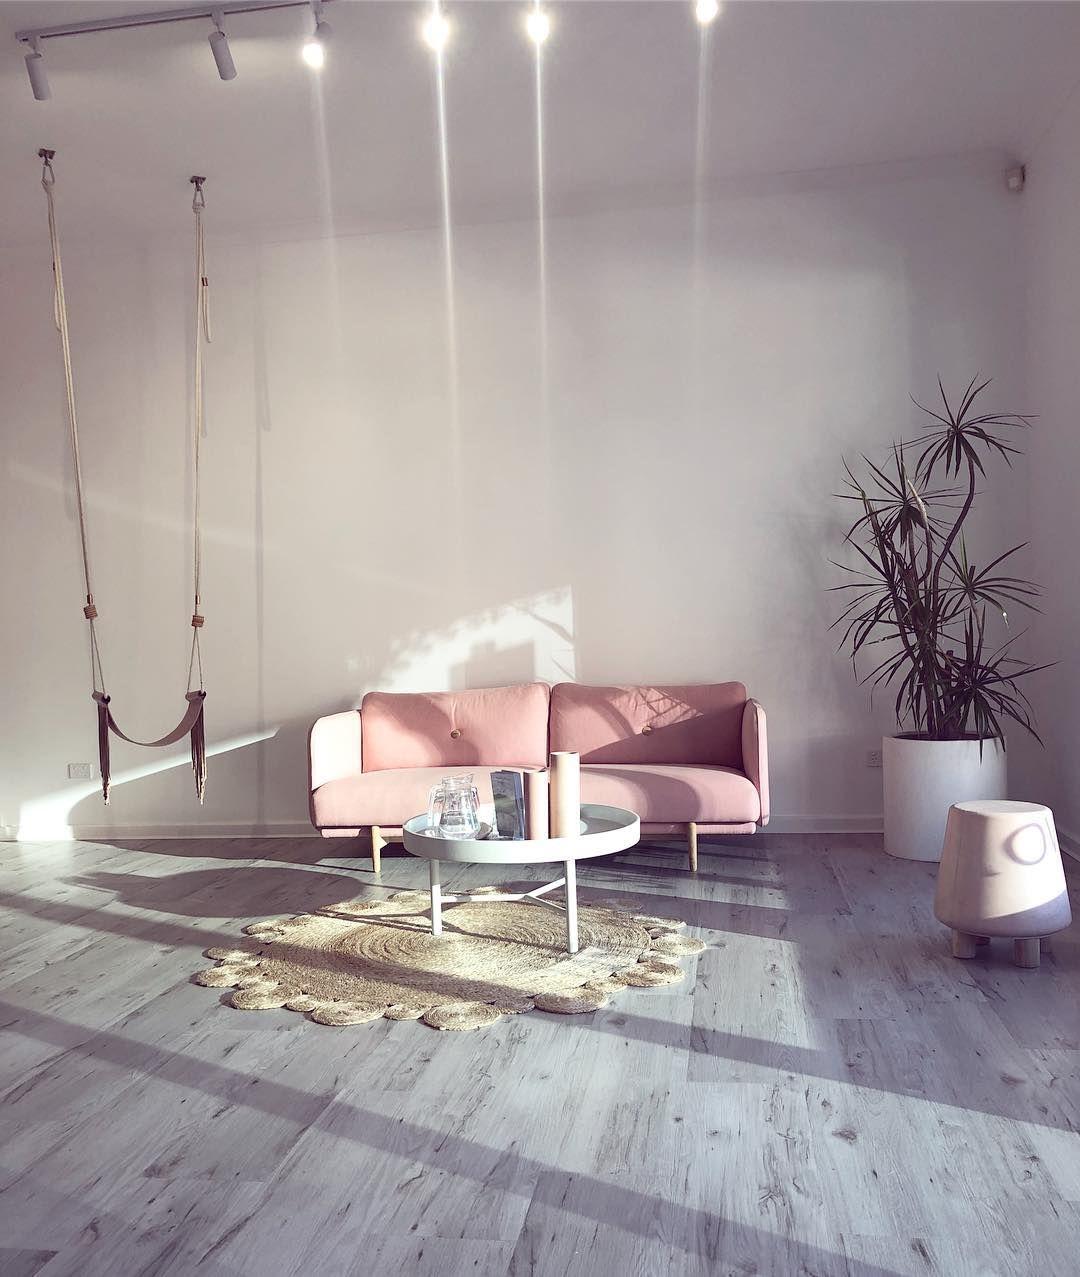 WAiting area, salon waiting area, salon design, salon furniture ...